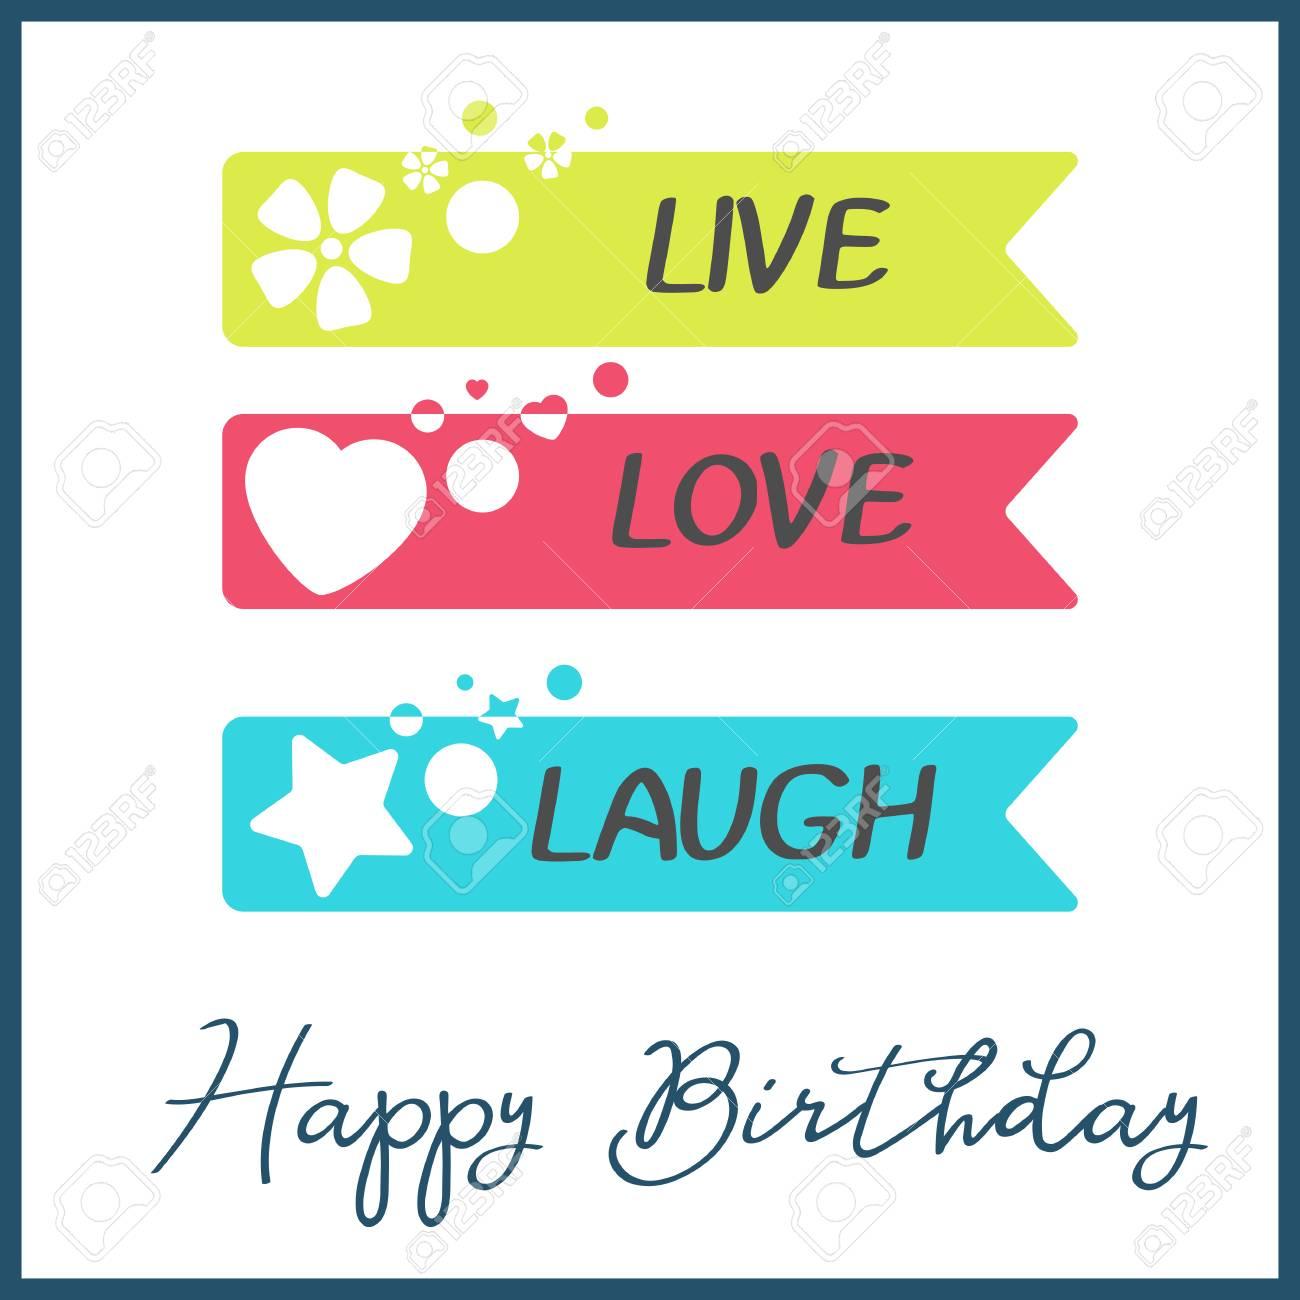 Bright Happy Birthday greeting card in minimalist style. Modern..